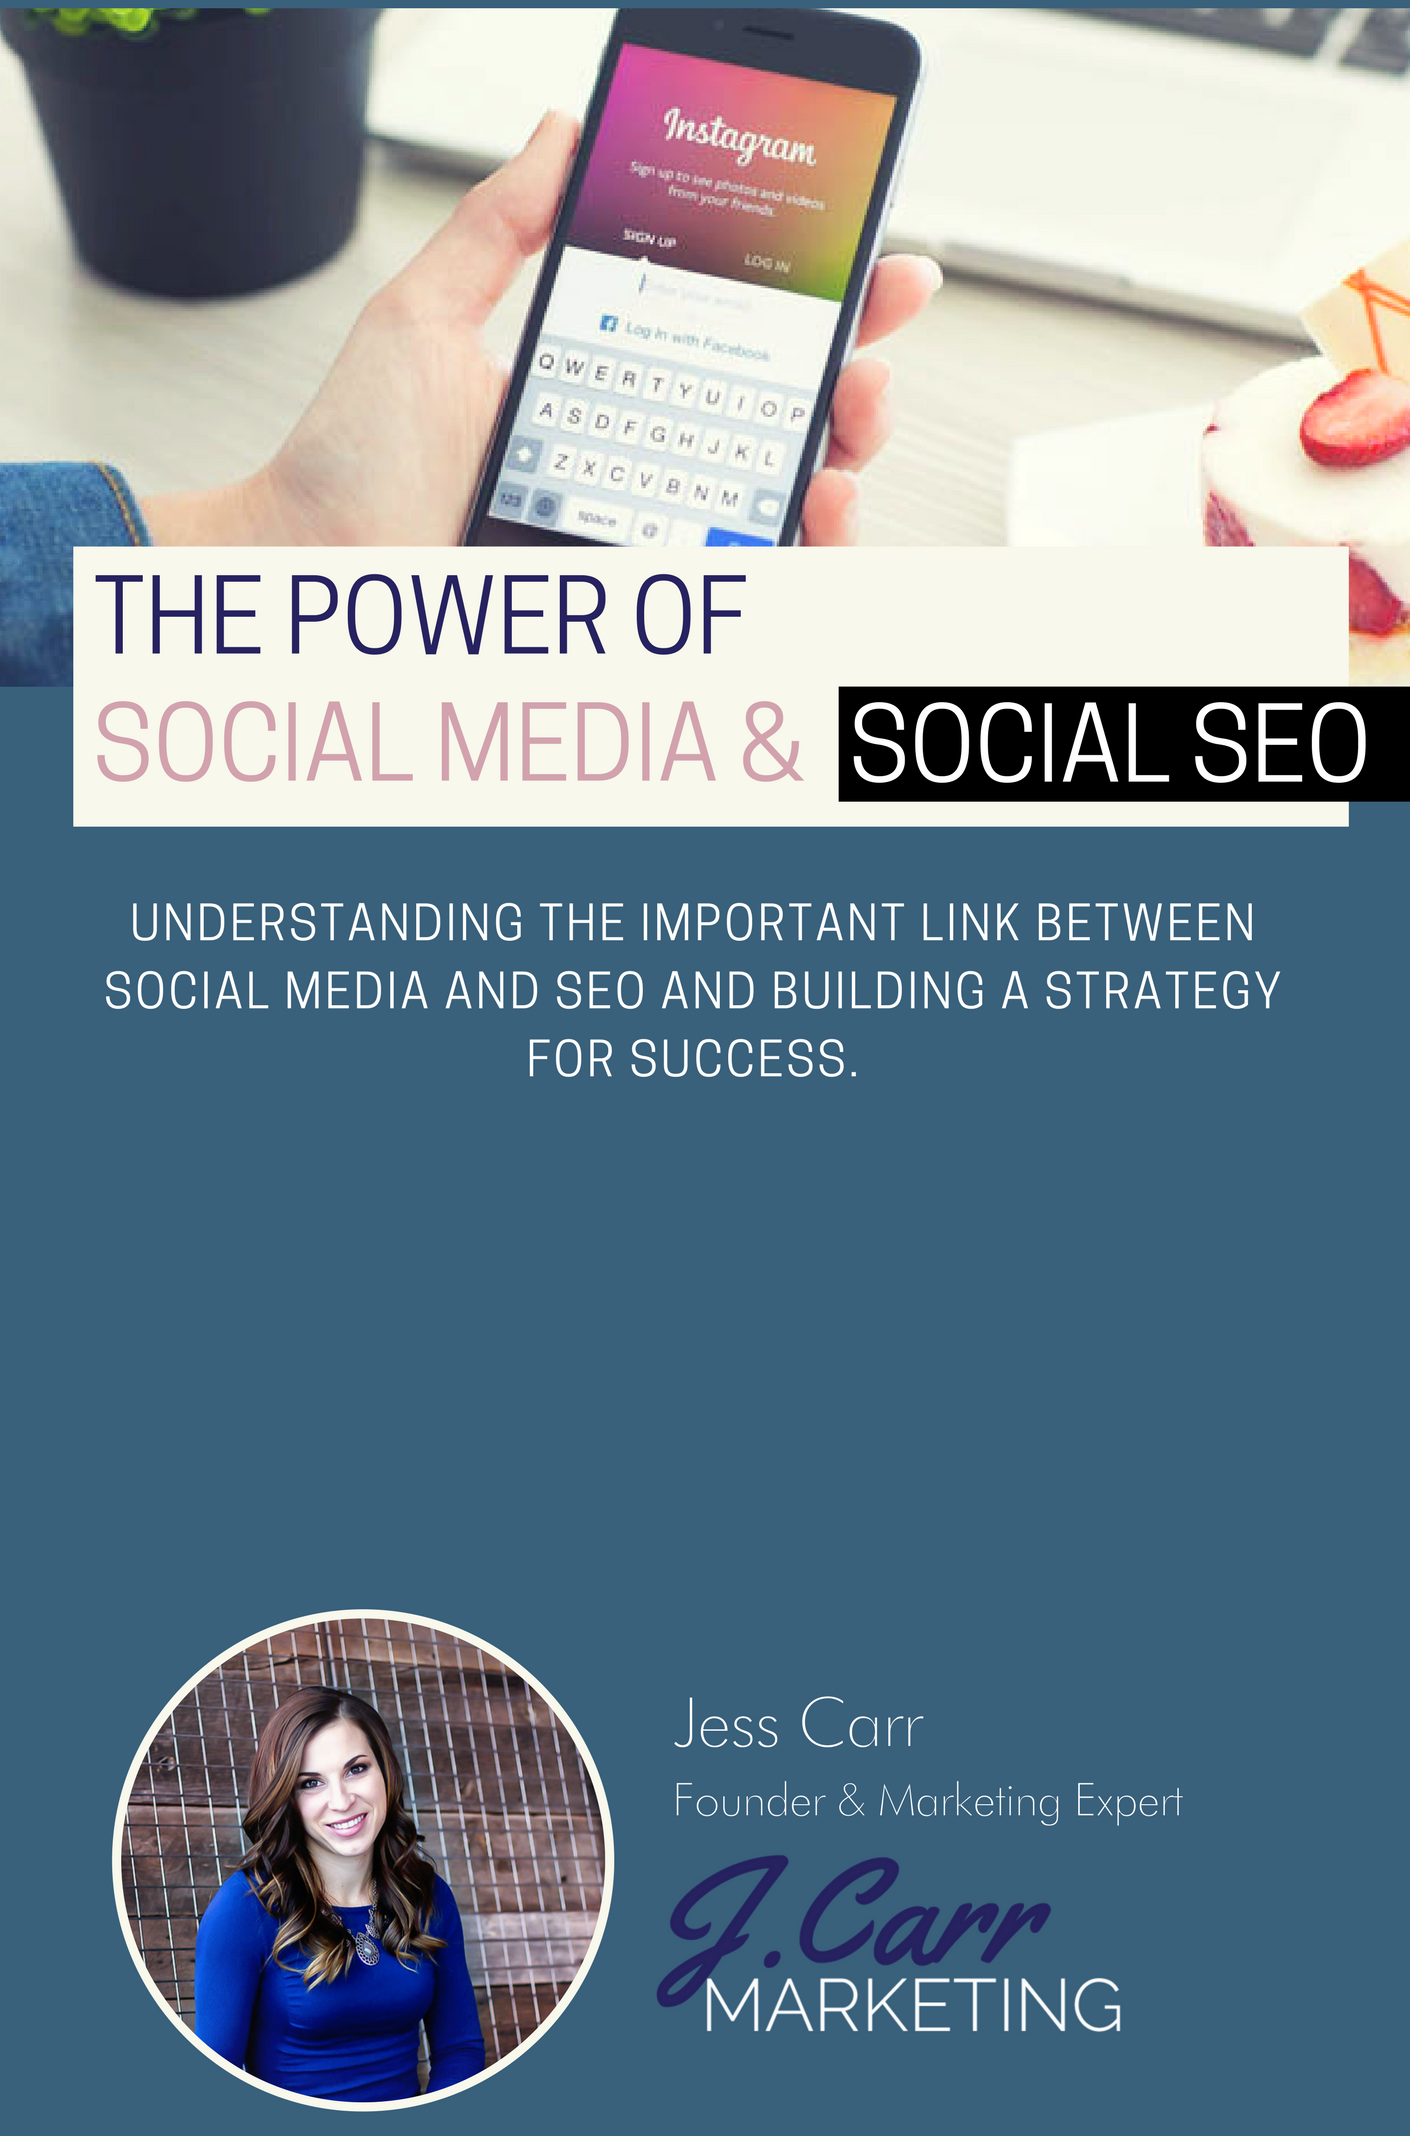 Power Of Social Media ebook Cover.png